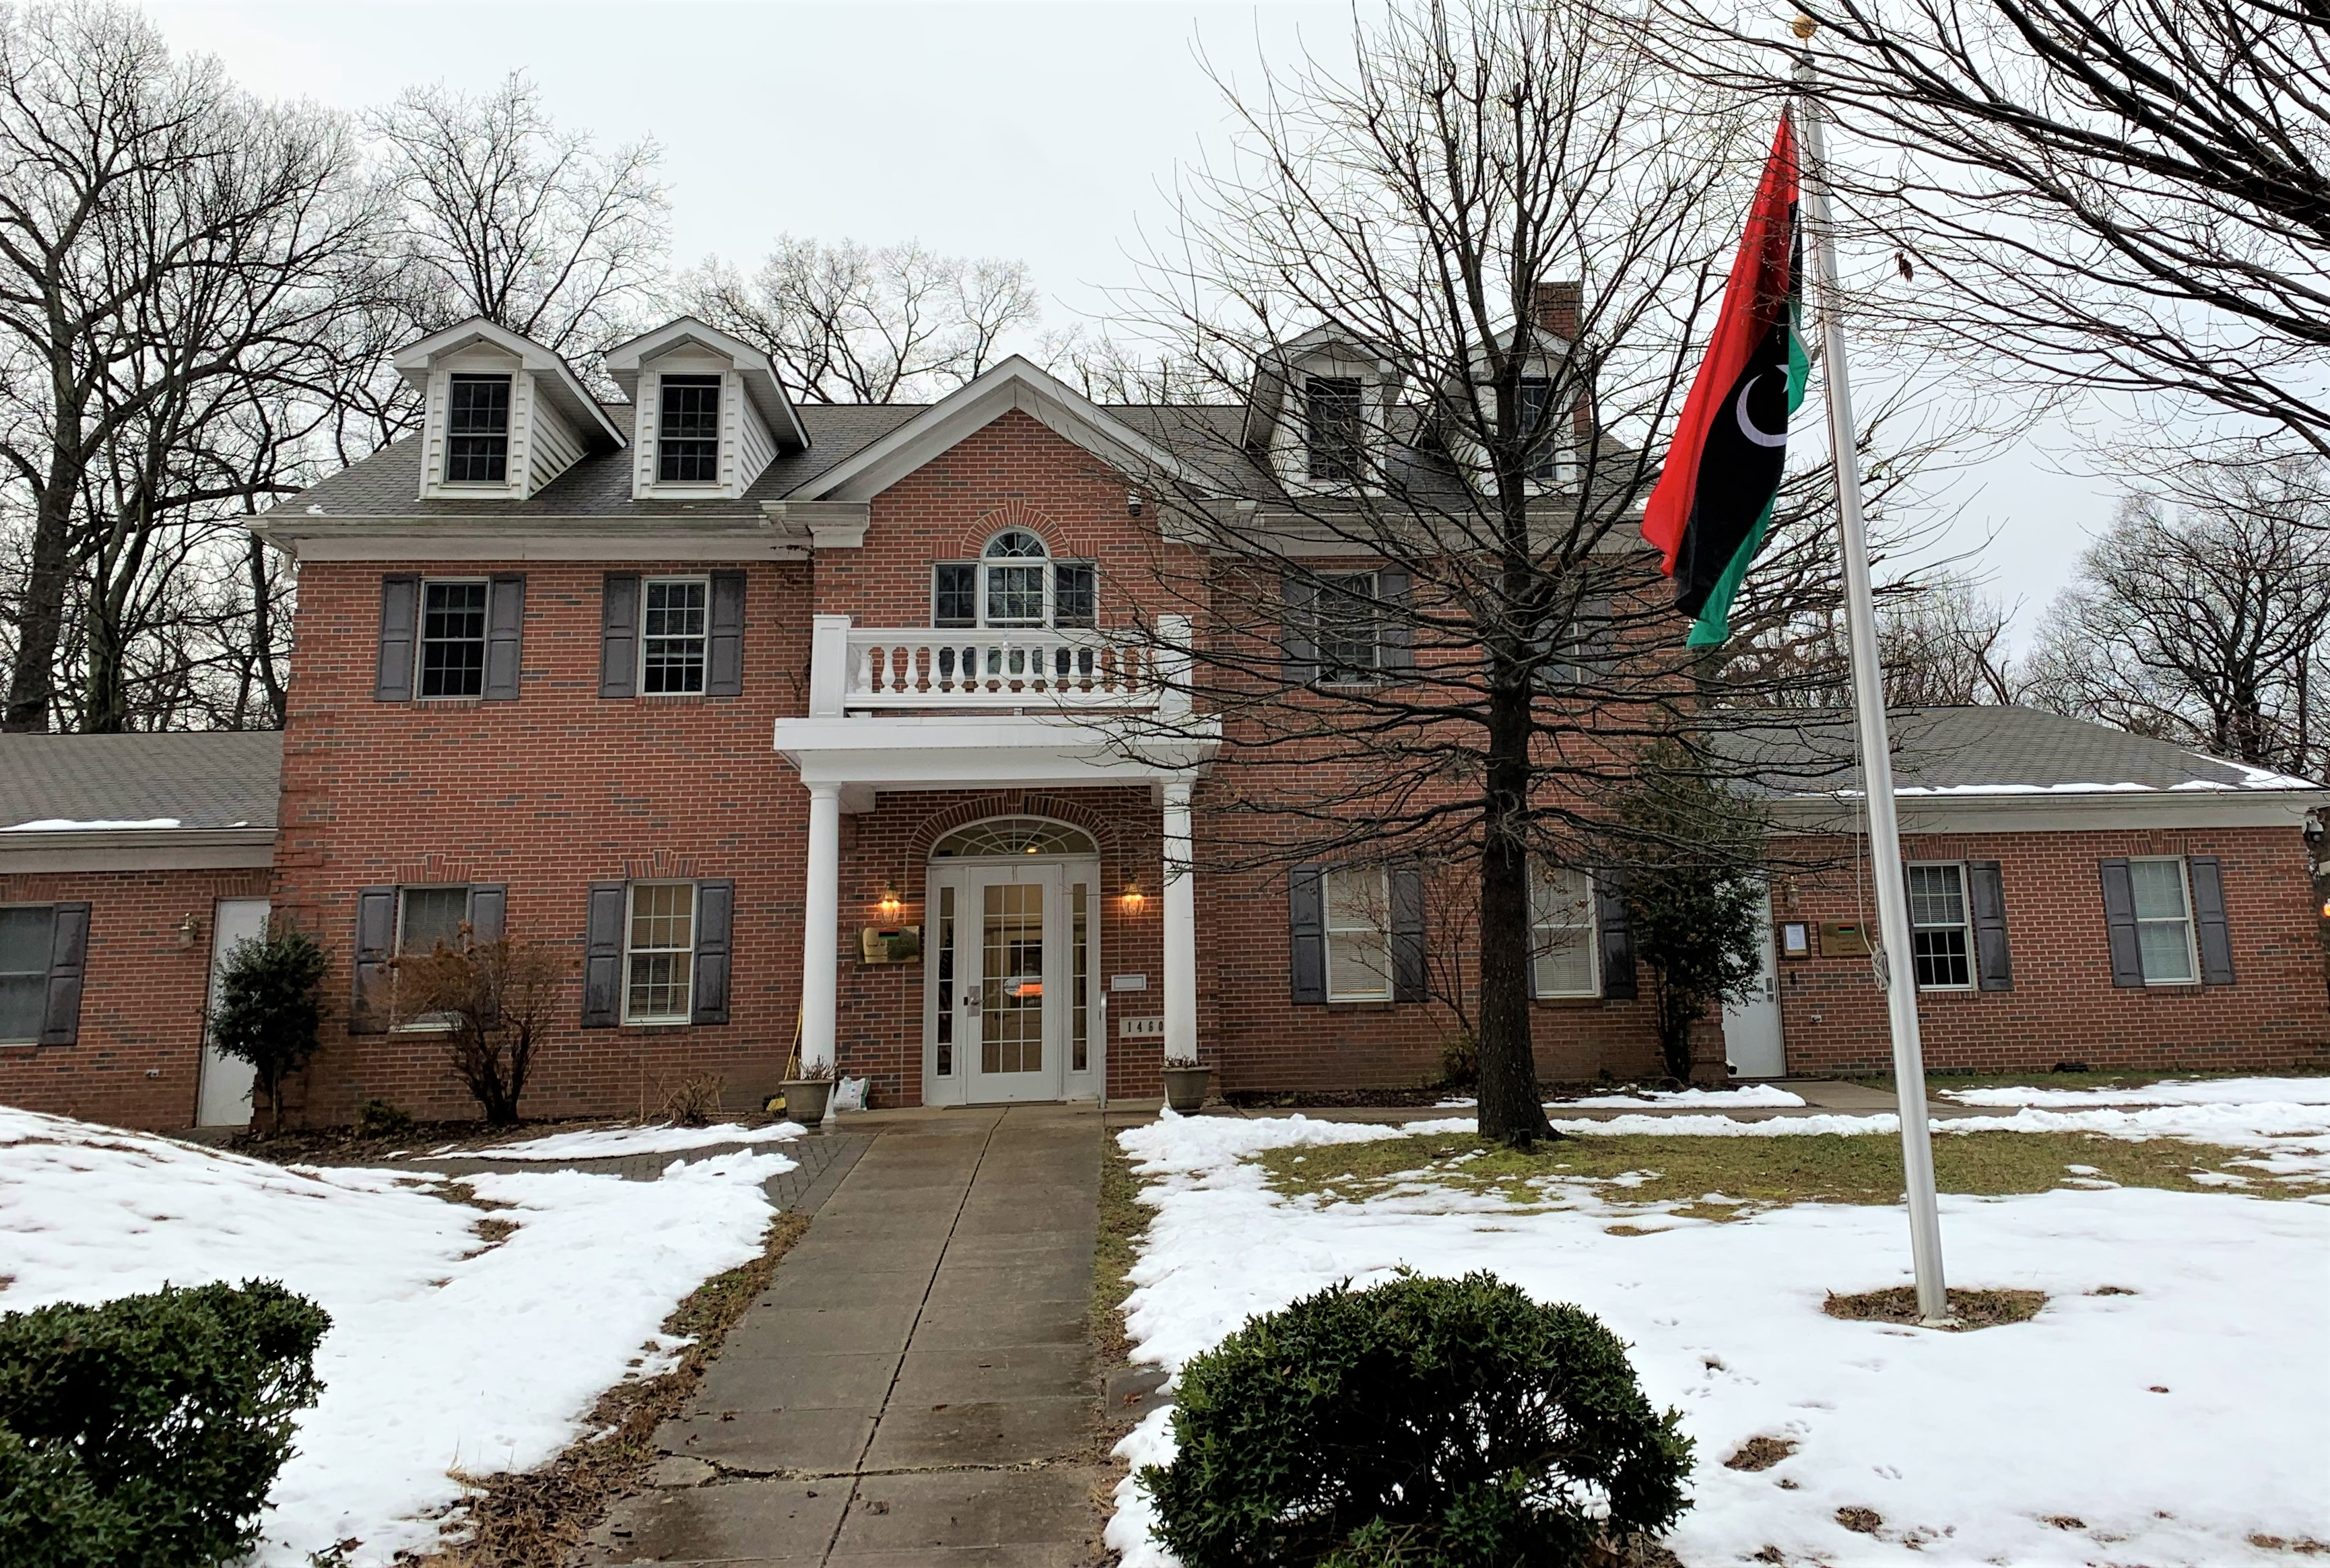 Real Estate and Homes For Sale Near the Embassy of Libya in Washington, DC. Artyom Shmatko Realtor